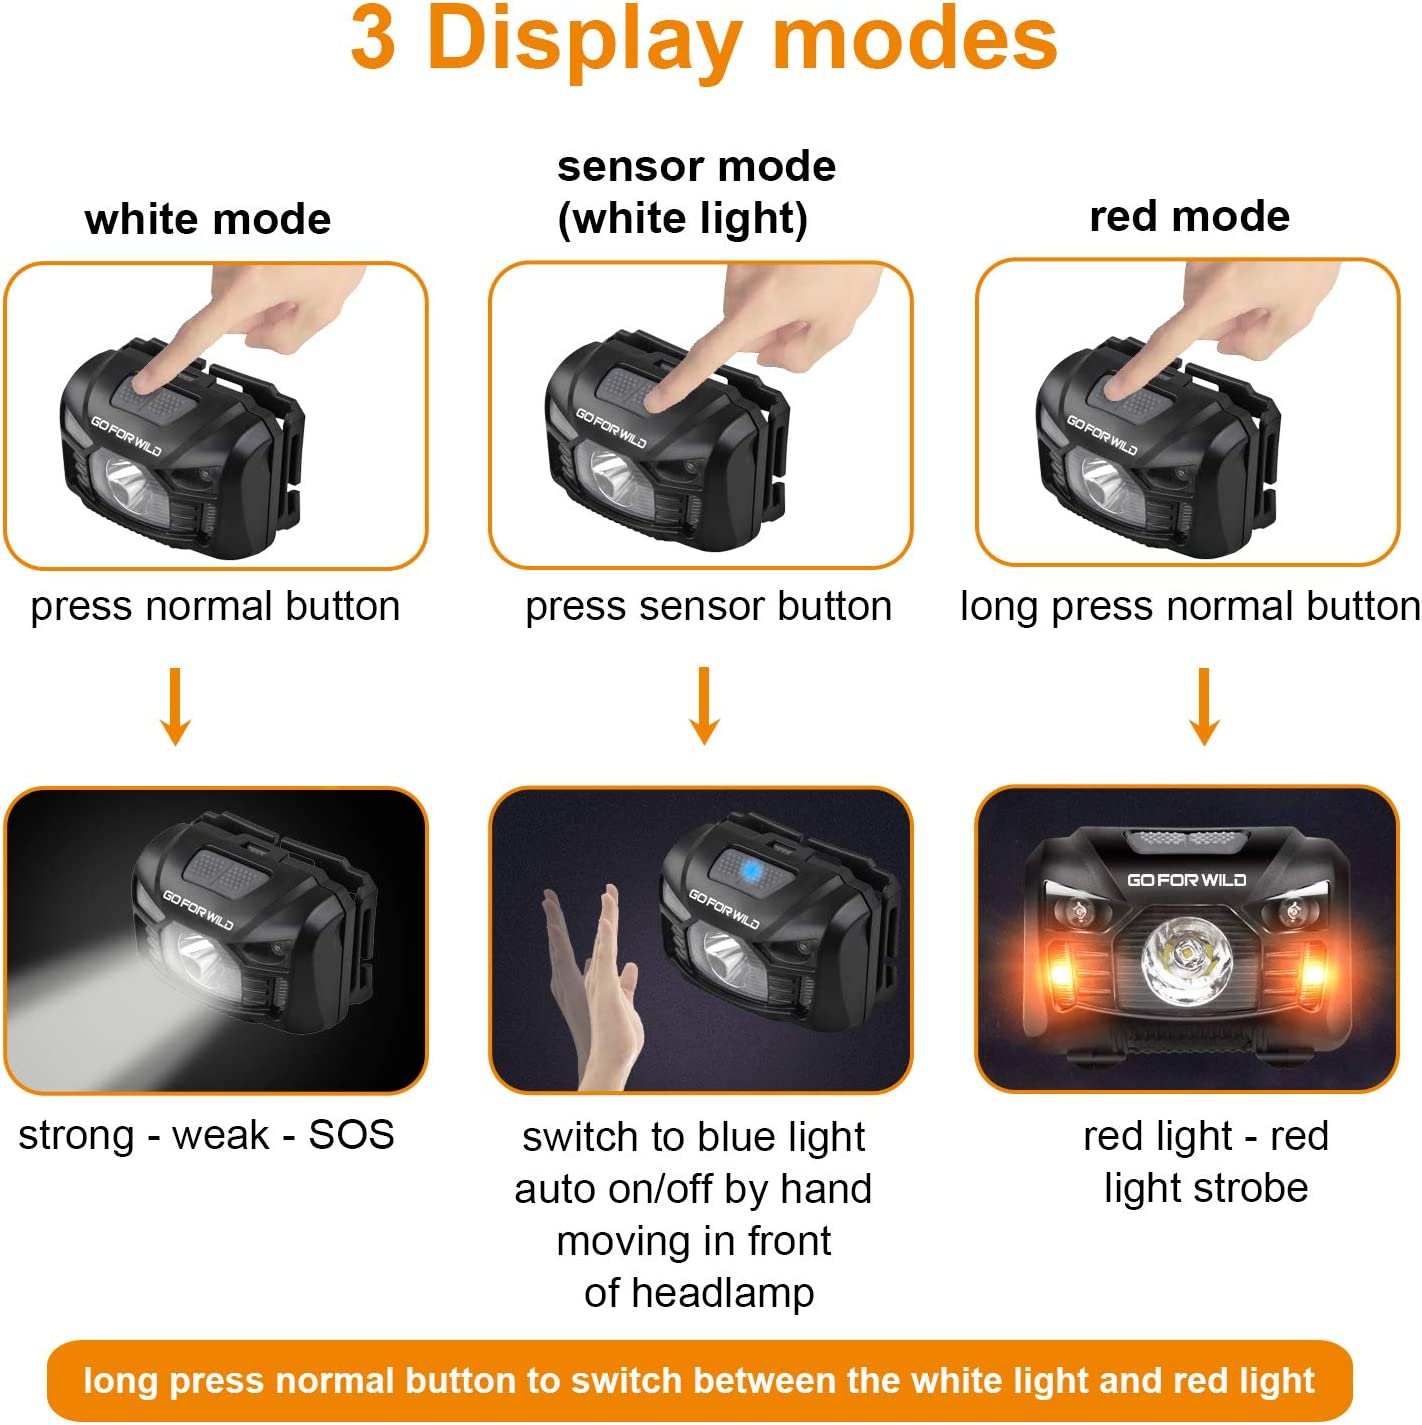 Headlamp Waterproof Lightweight Adjustable Headband 5 Display Modes Perfect for Running Hiking 500 Lumens White Cree LED Head Lamp Flashlight with Redlight and Motion Sensor Switch